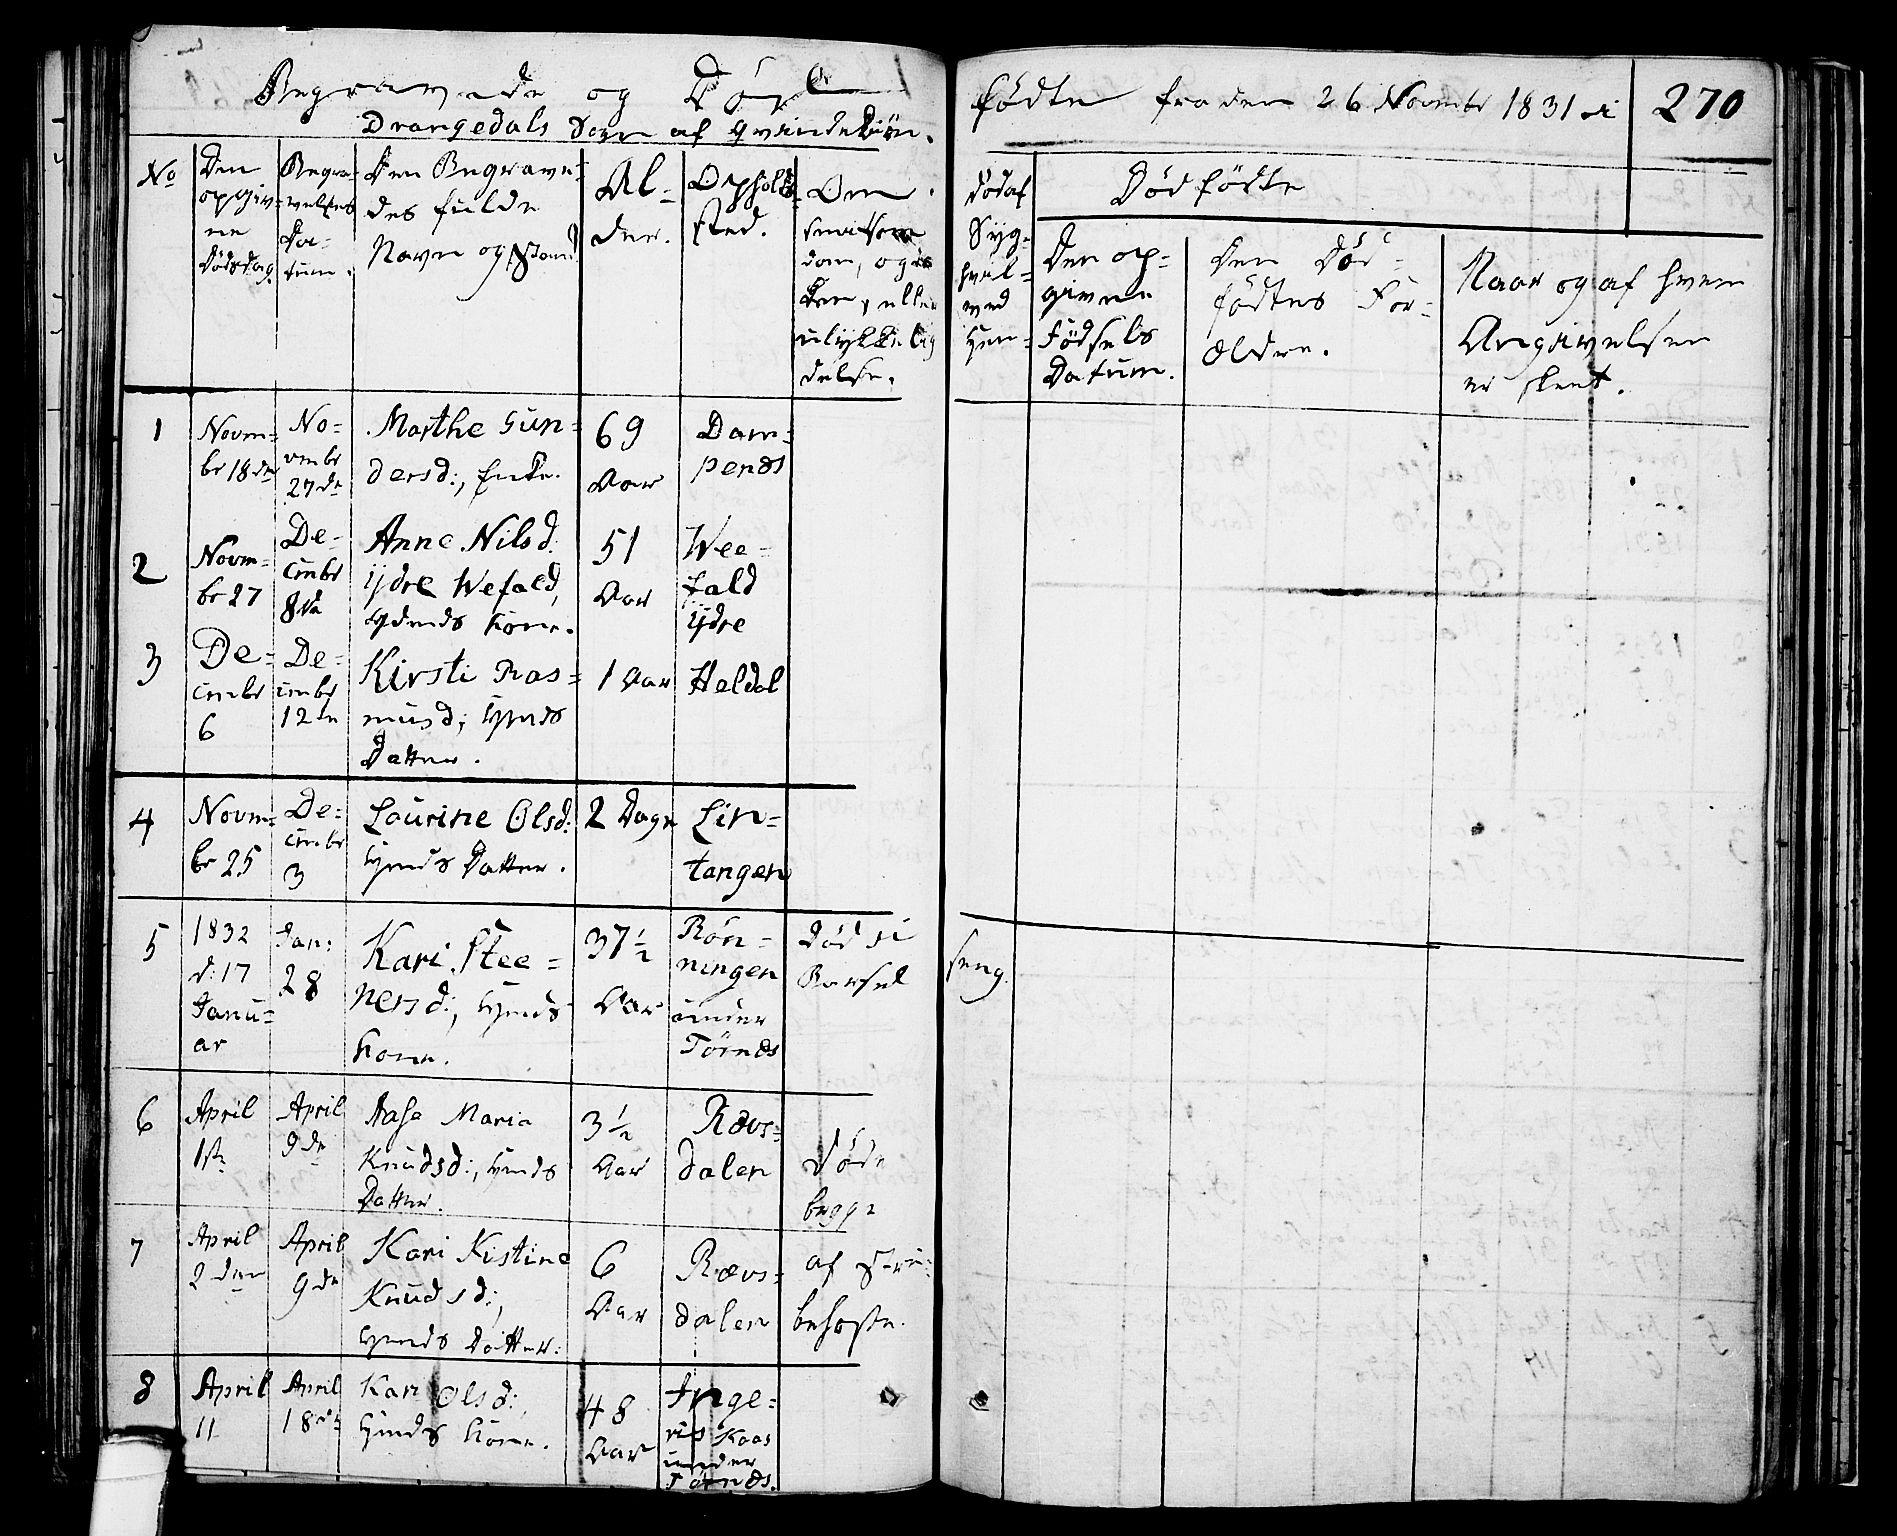 SAKO, Drangedal kirkebøker, F/Fa/L0006: Ministerialbok nr. 6, 1831-1837, s. 270